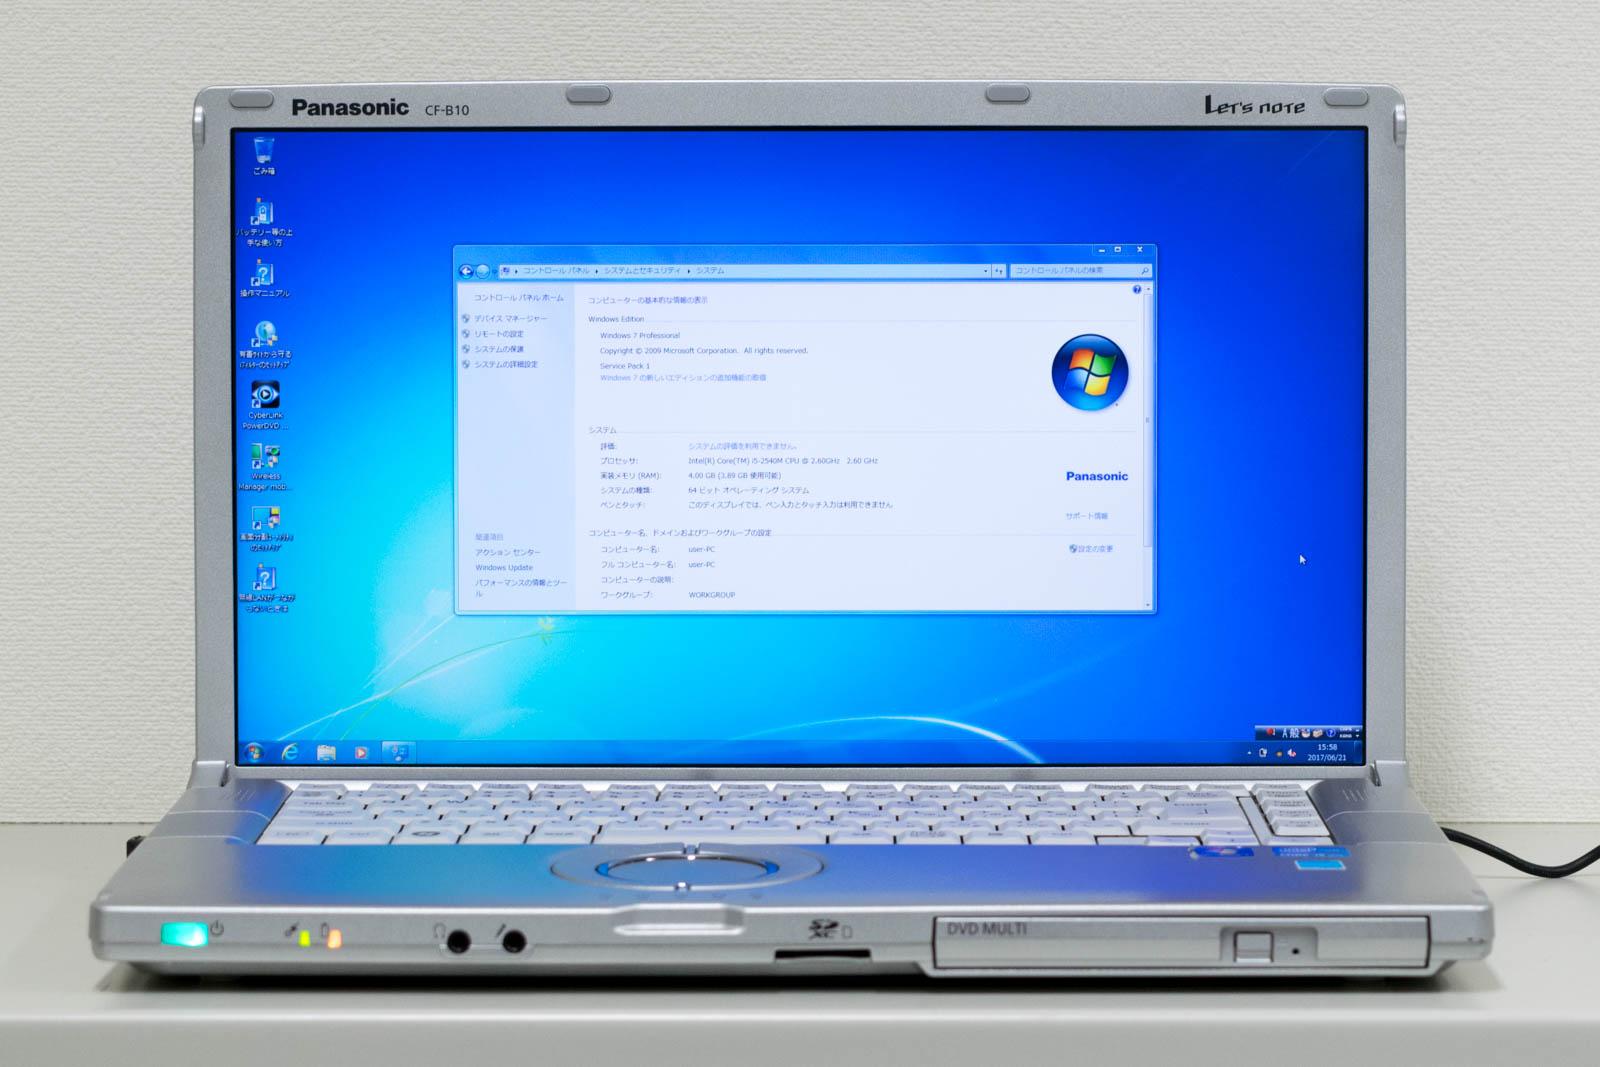 Panasonic レッツノート CF-B10EWCYS A4ノートパソコン Windows 7 Professional 64bit [Core i5-2540M], 累積使用時間:5460時間 【中古】